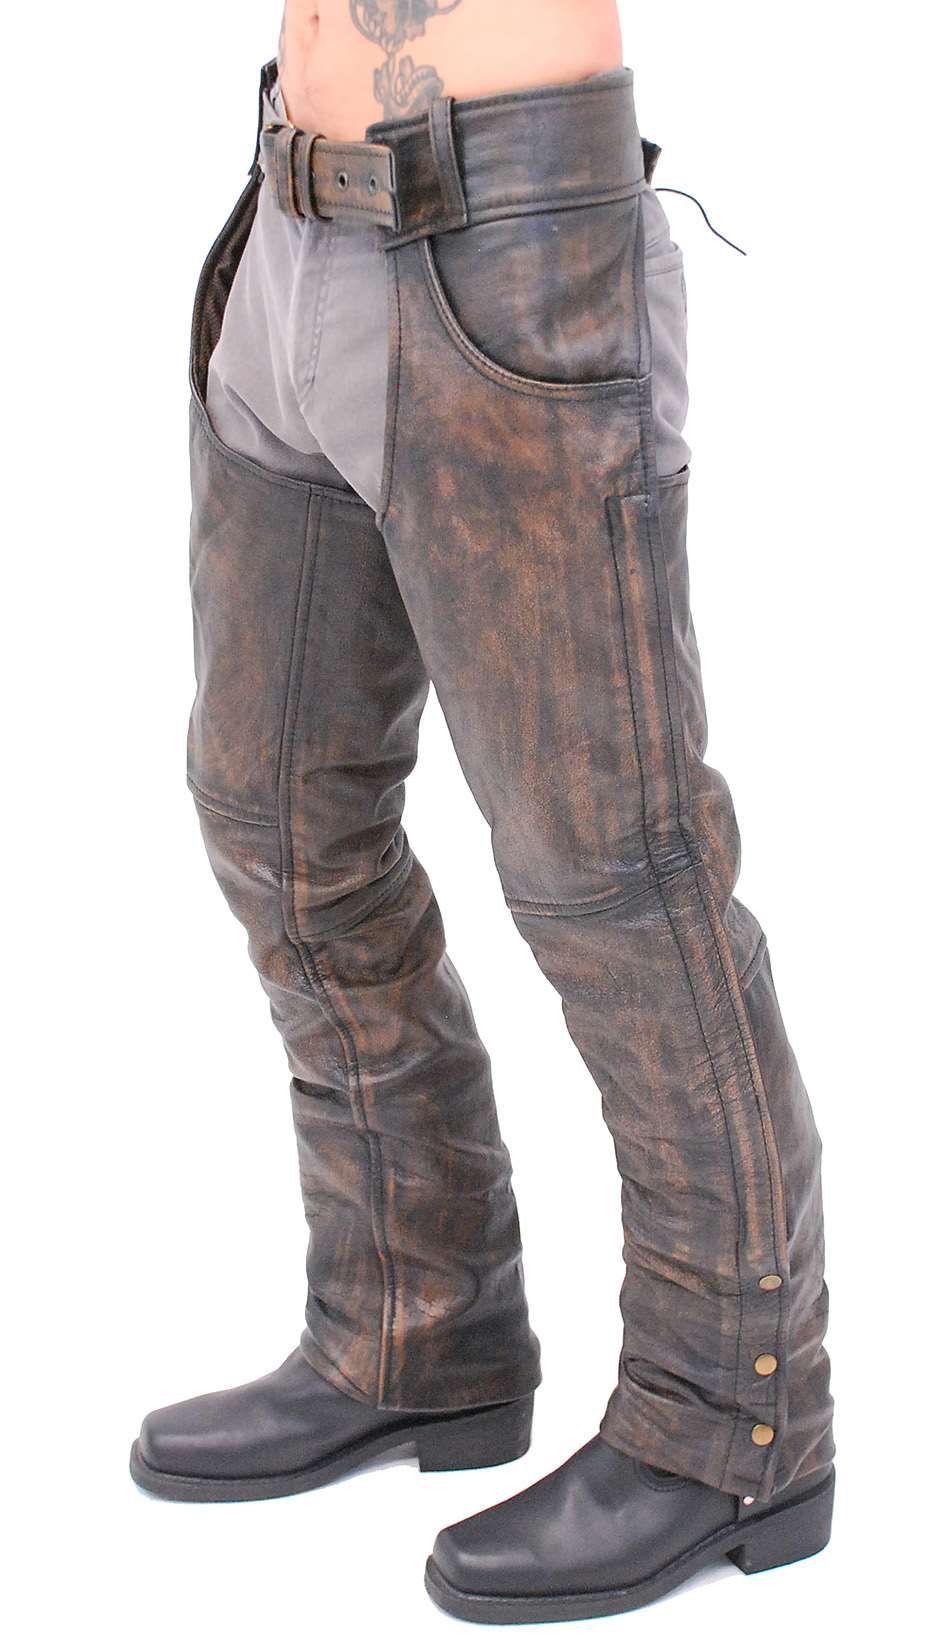 Premium Heavy Brown Vintage Deep Pocket Chaps Ca7202pn Biker Wear Motorcycle Chaps Leather Men